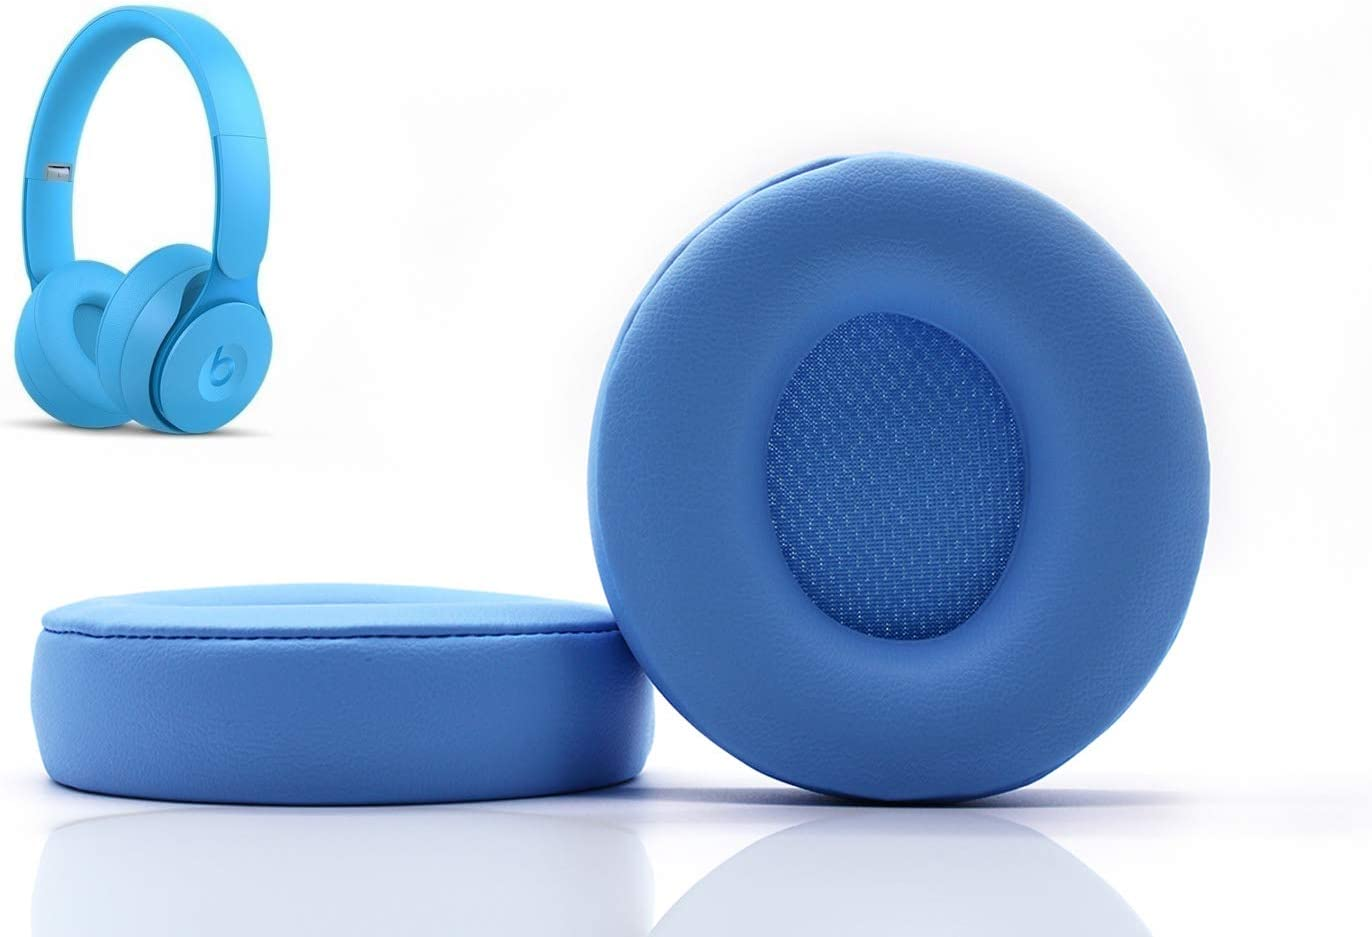 Almohadillas para Auriculares Beats Solo pro (celeste)